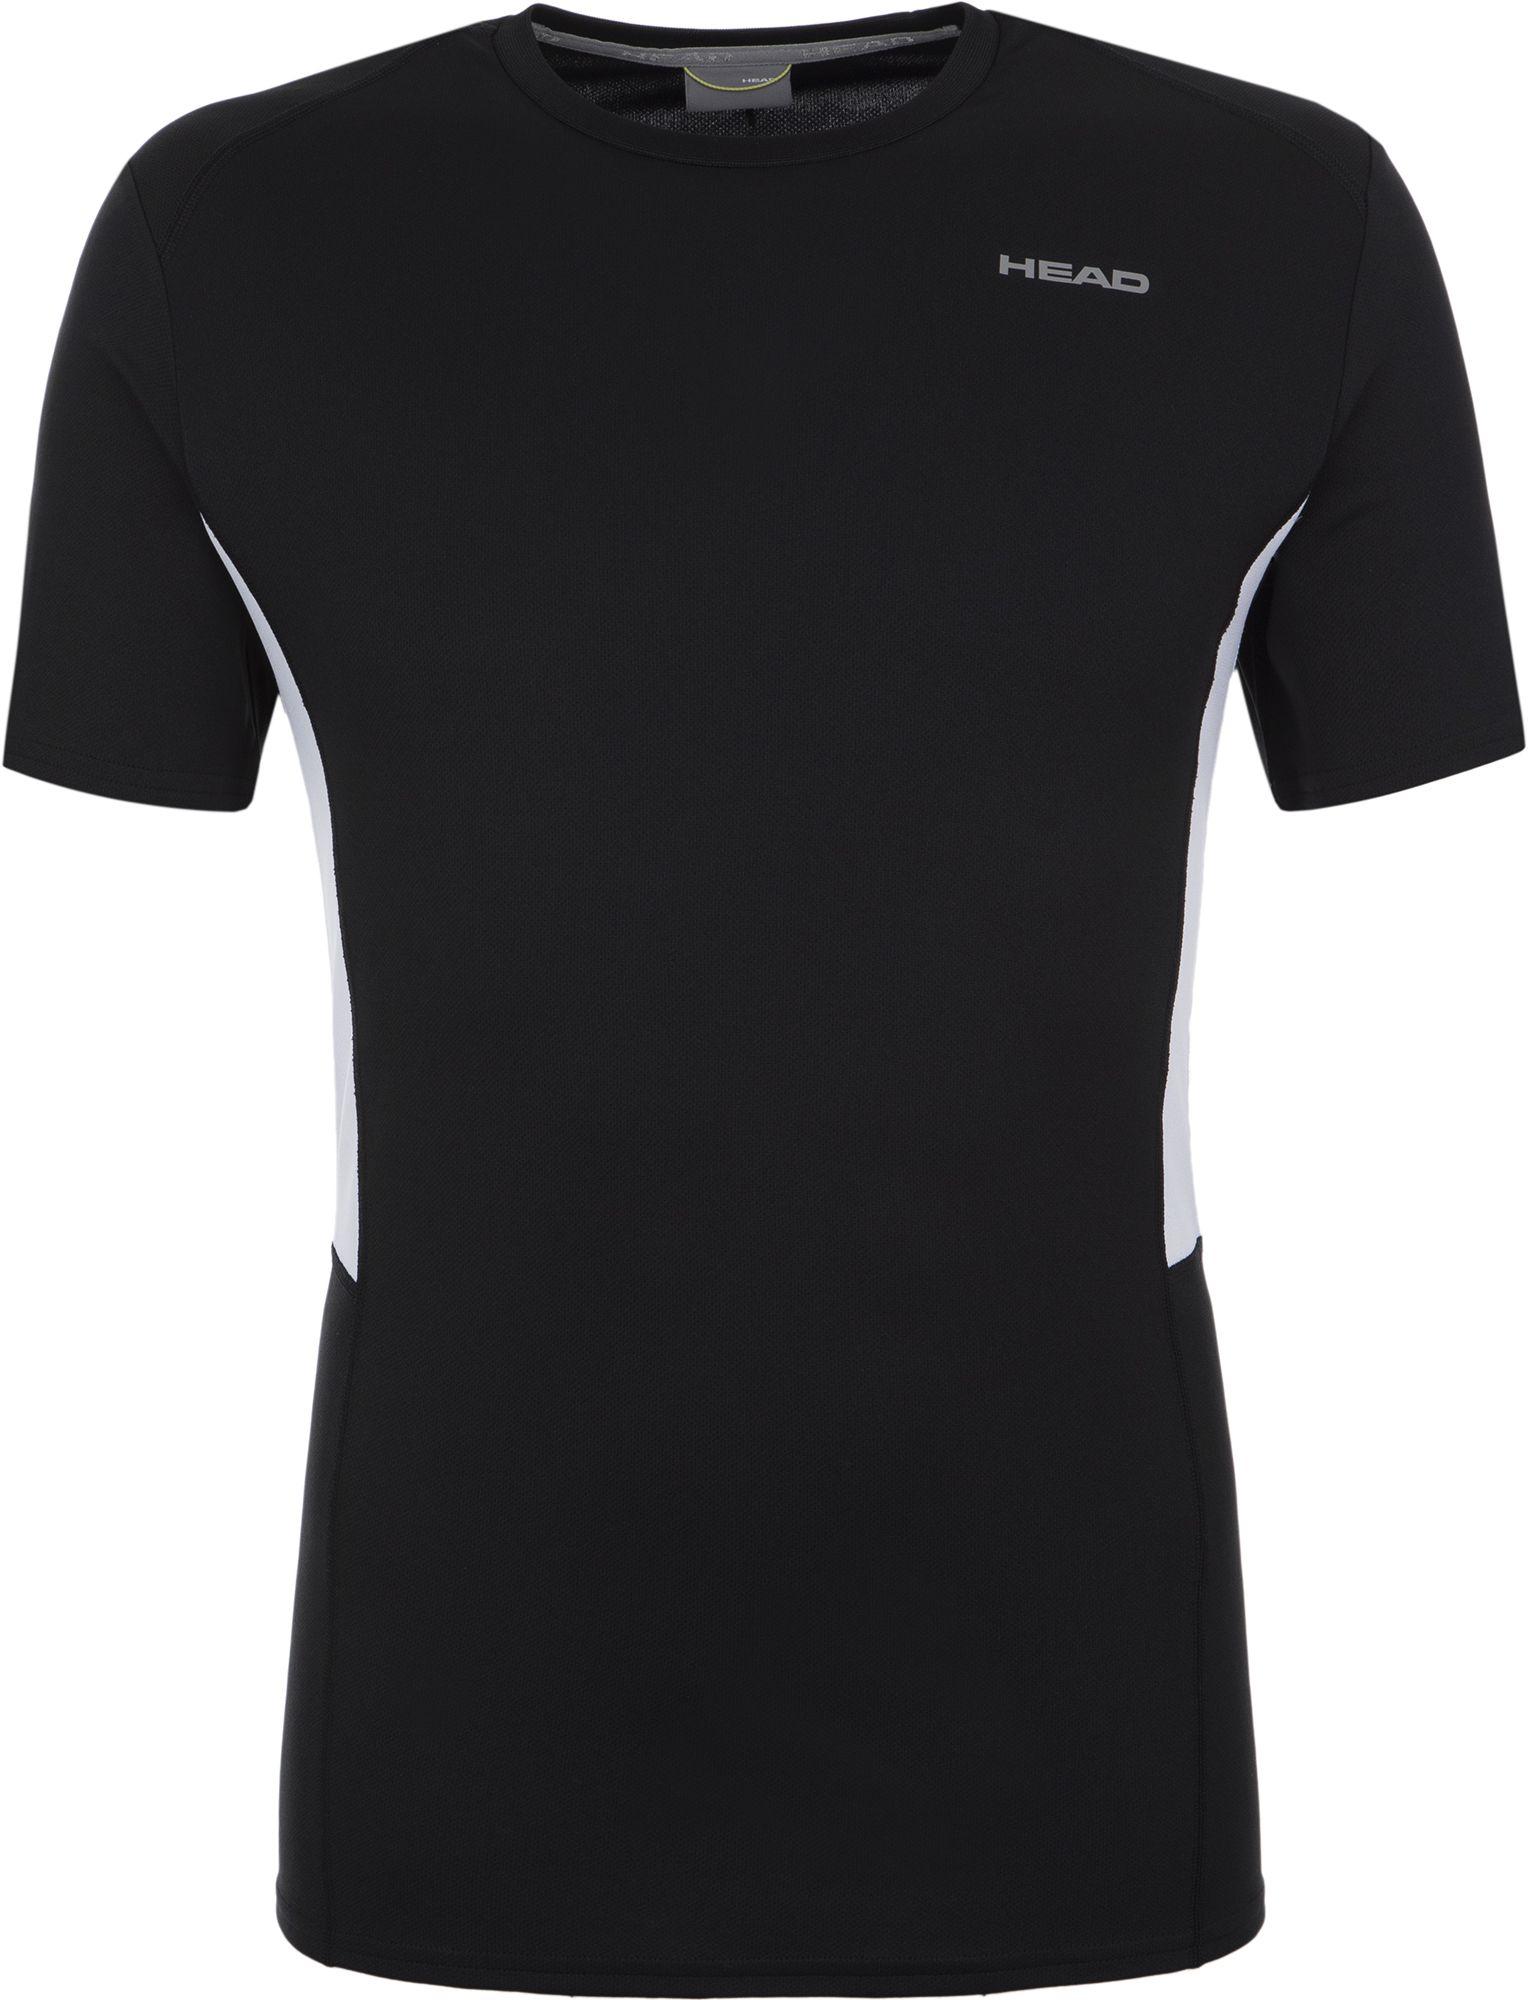 Head Футболка мужская Head Club Tech, размер 50 head шорты мужские head club shorts размер 52